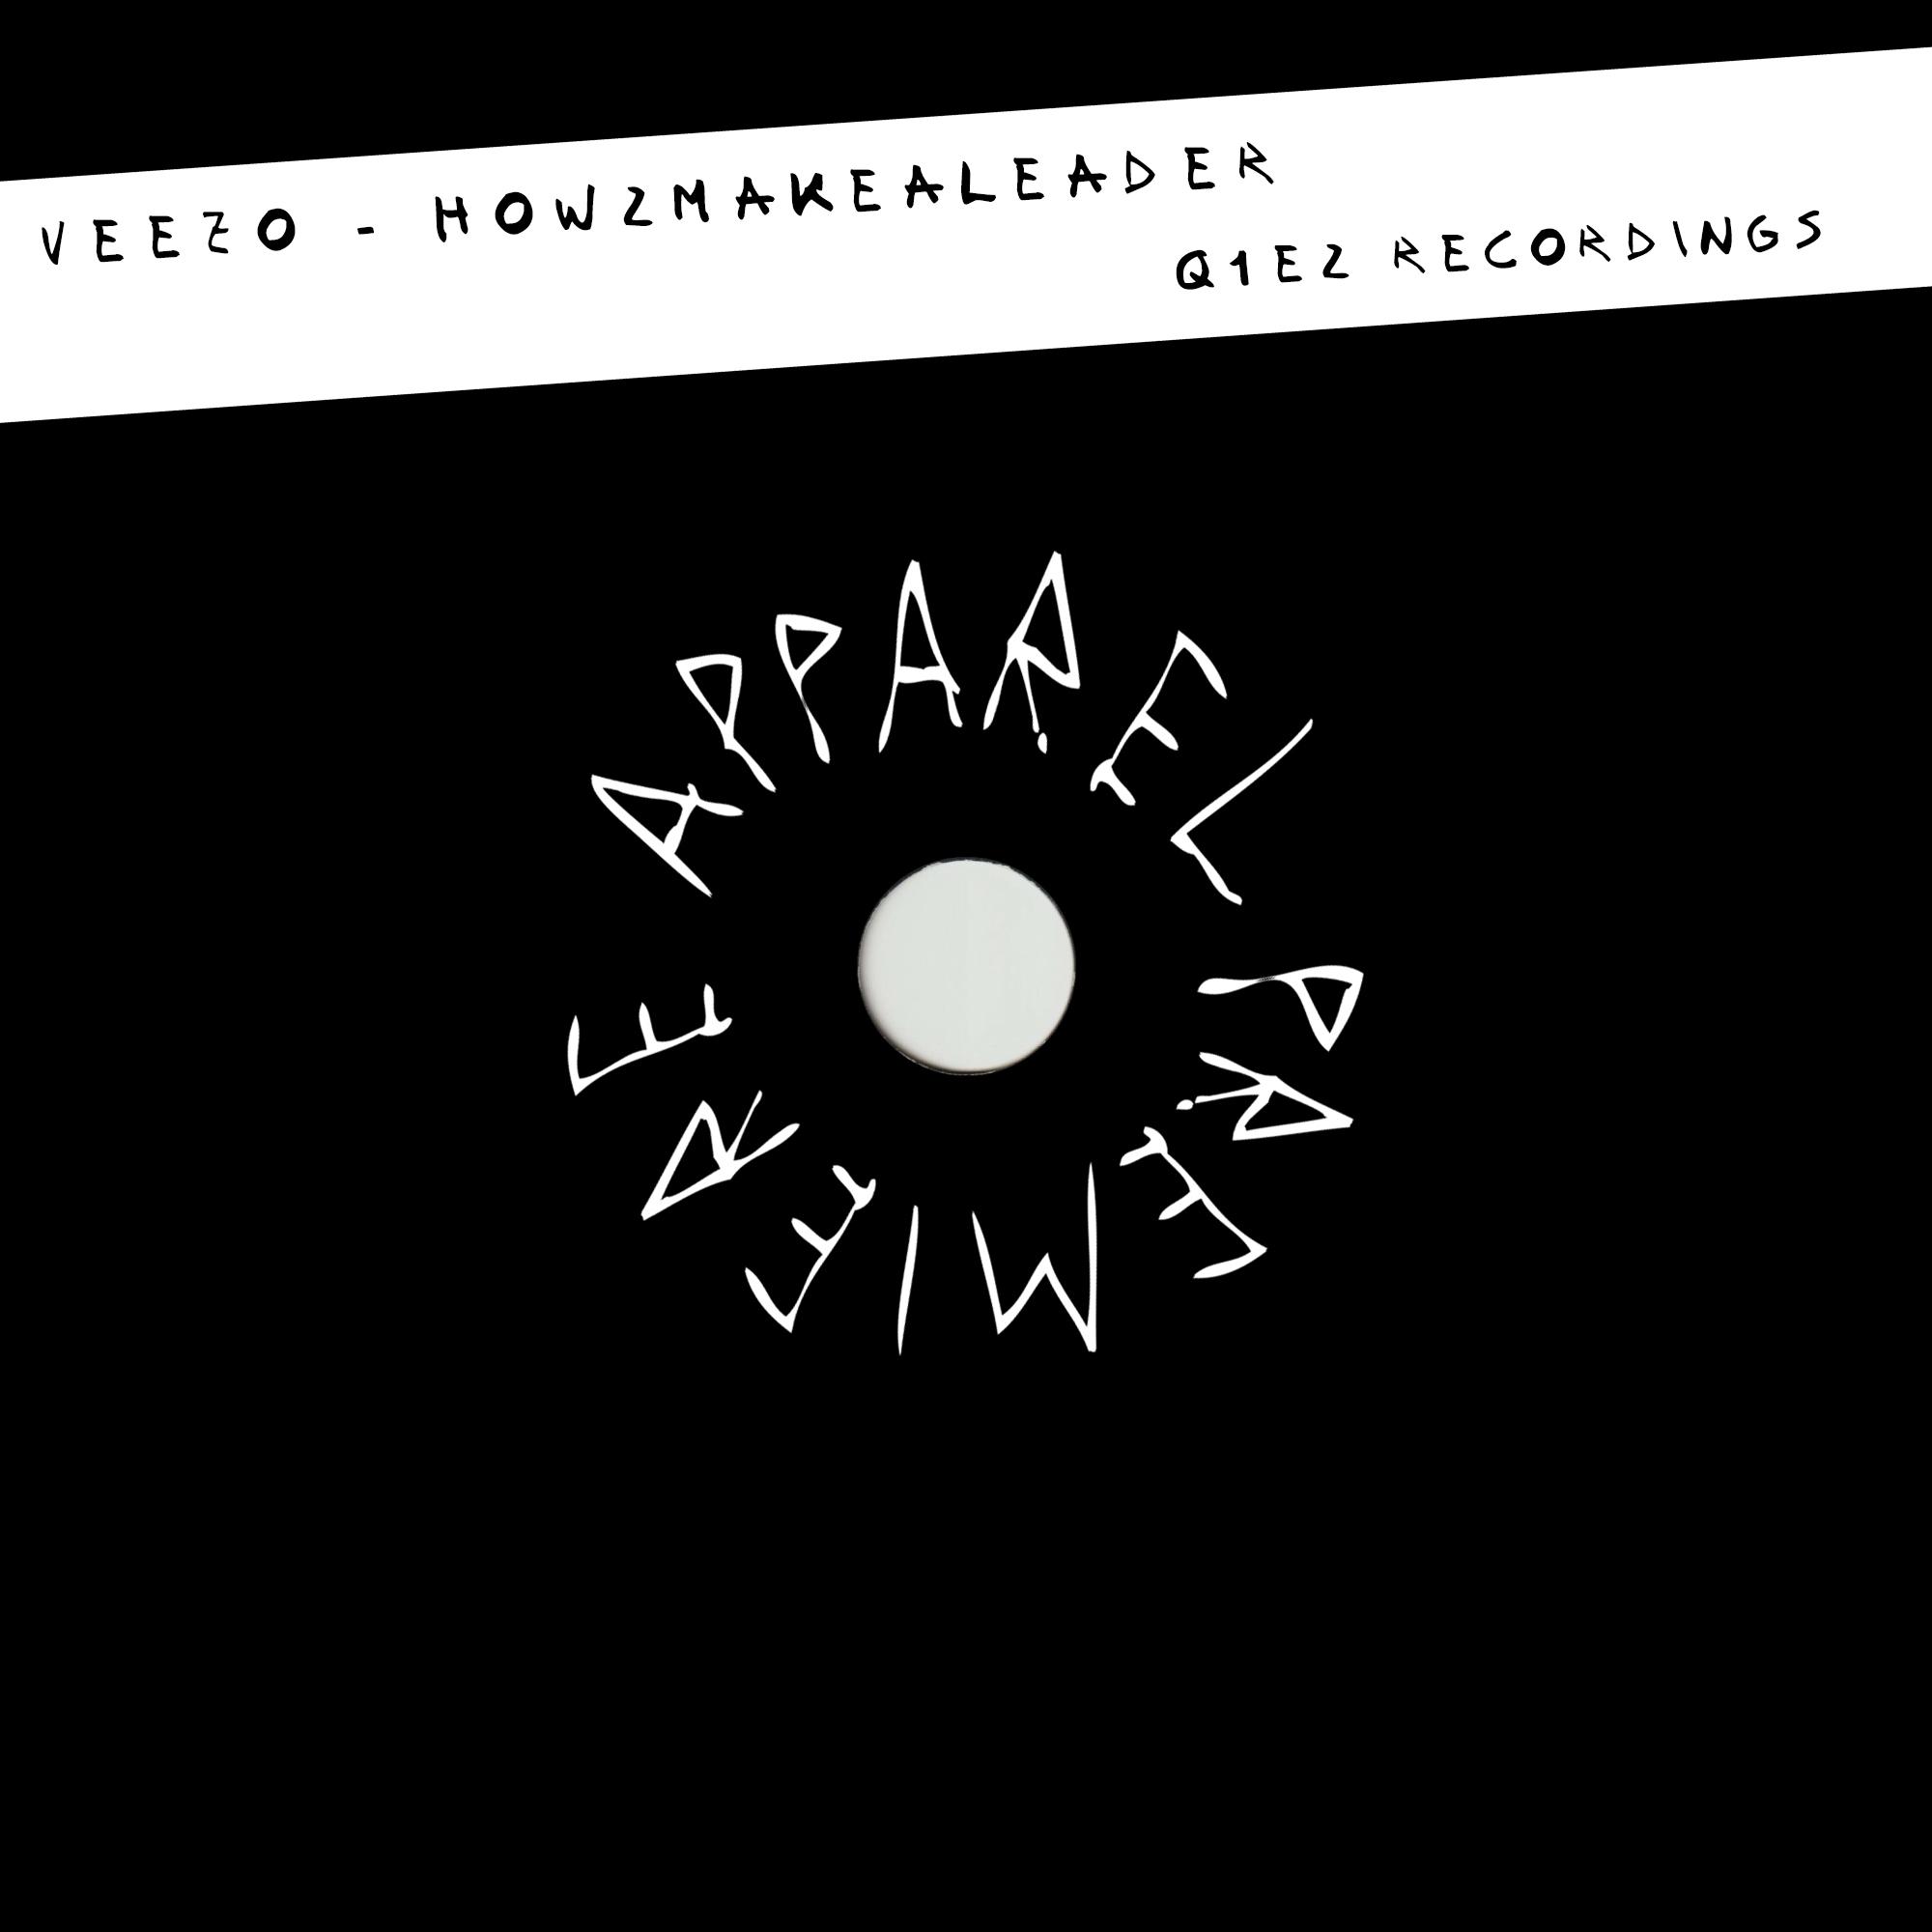 APPAREL PREMIERE: Veezo – How2makeaLeader [Q1E2 Recordings]